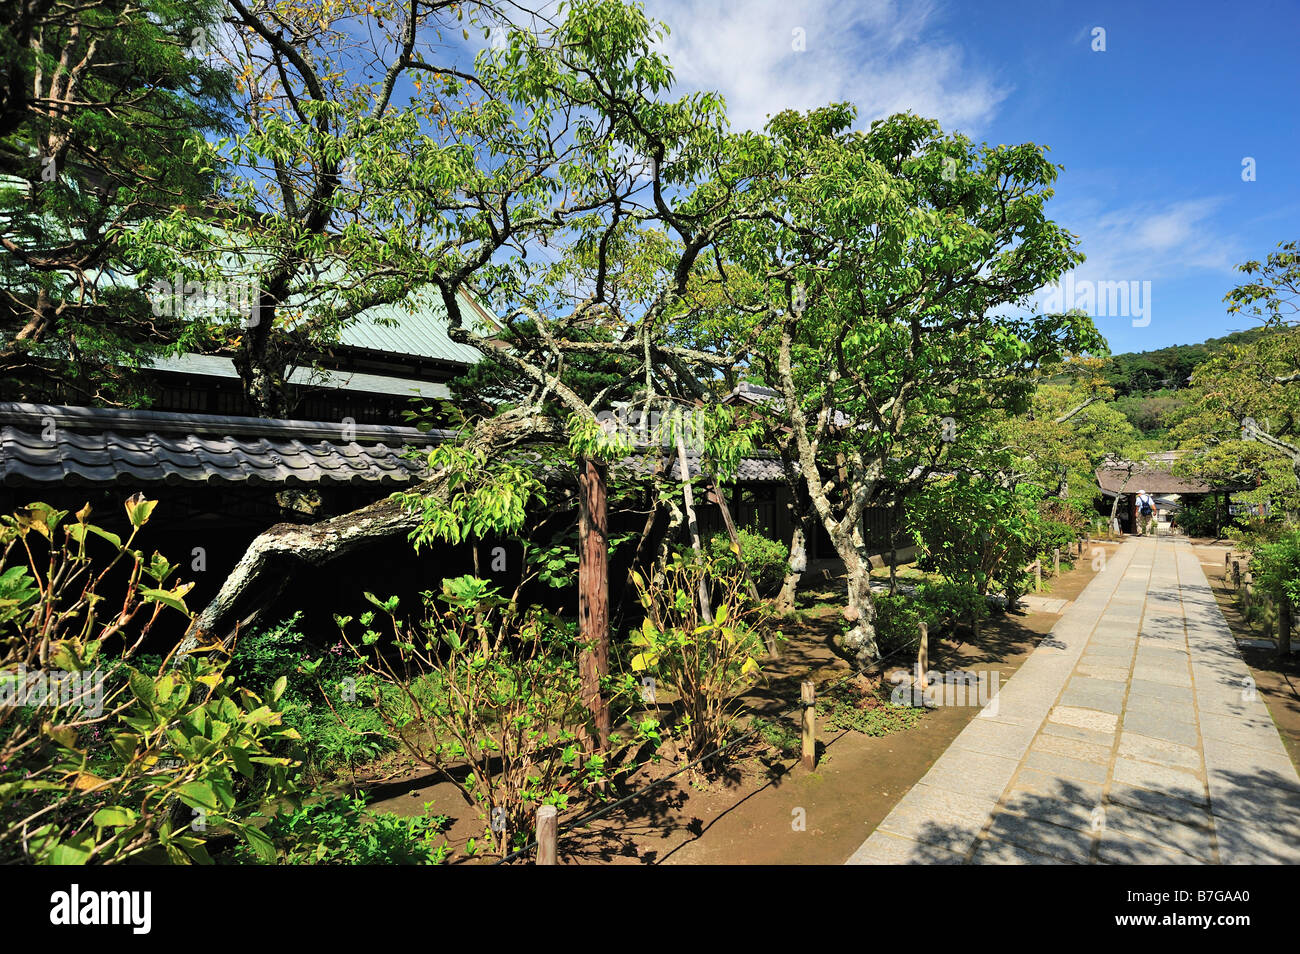 Tokei-ji, Kamakura, Kanagawa Prefecture, Japan - Stock Image